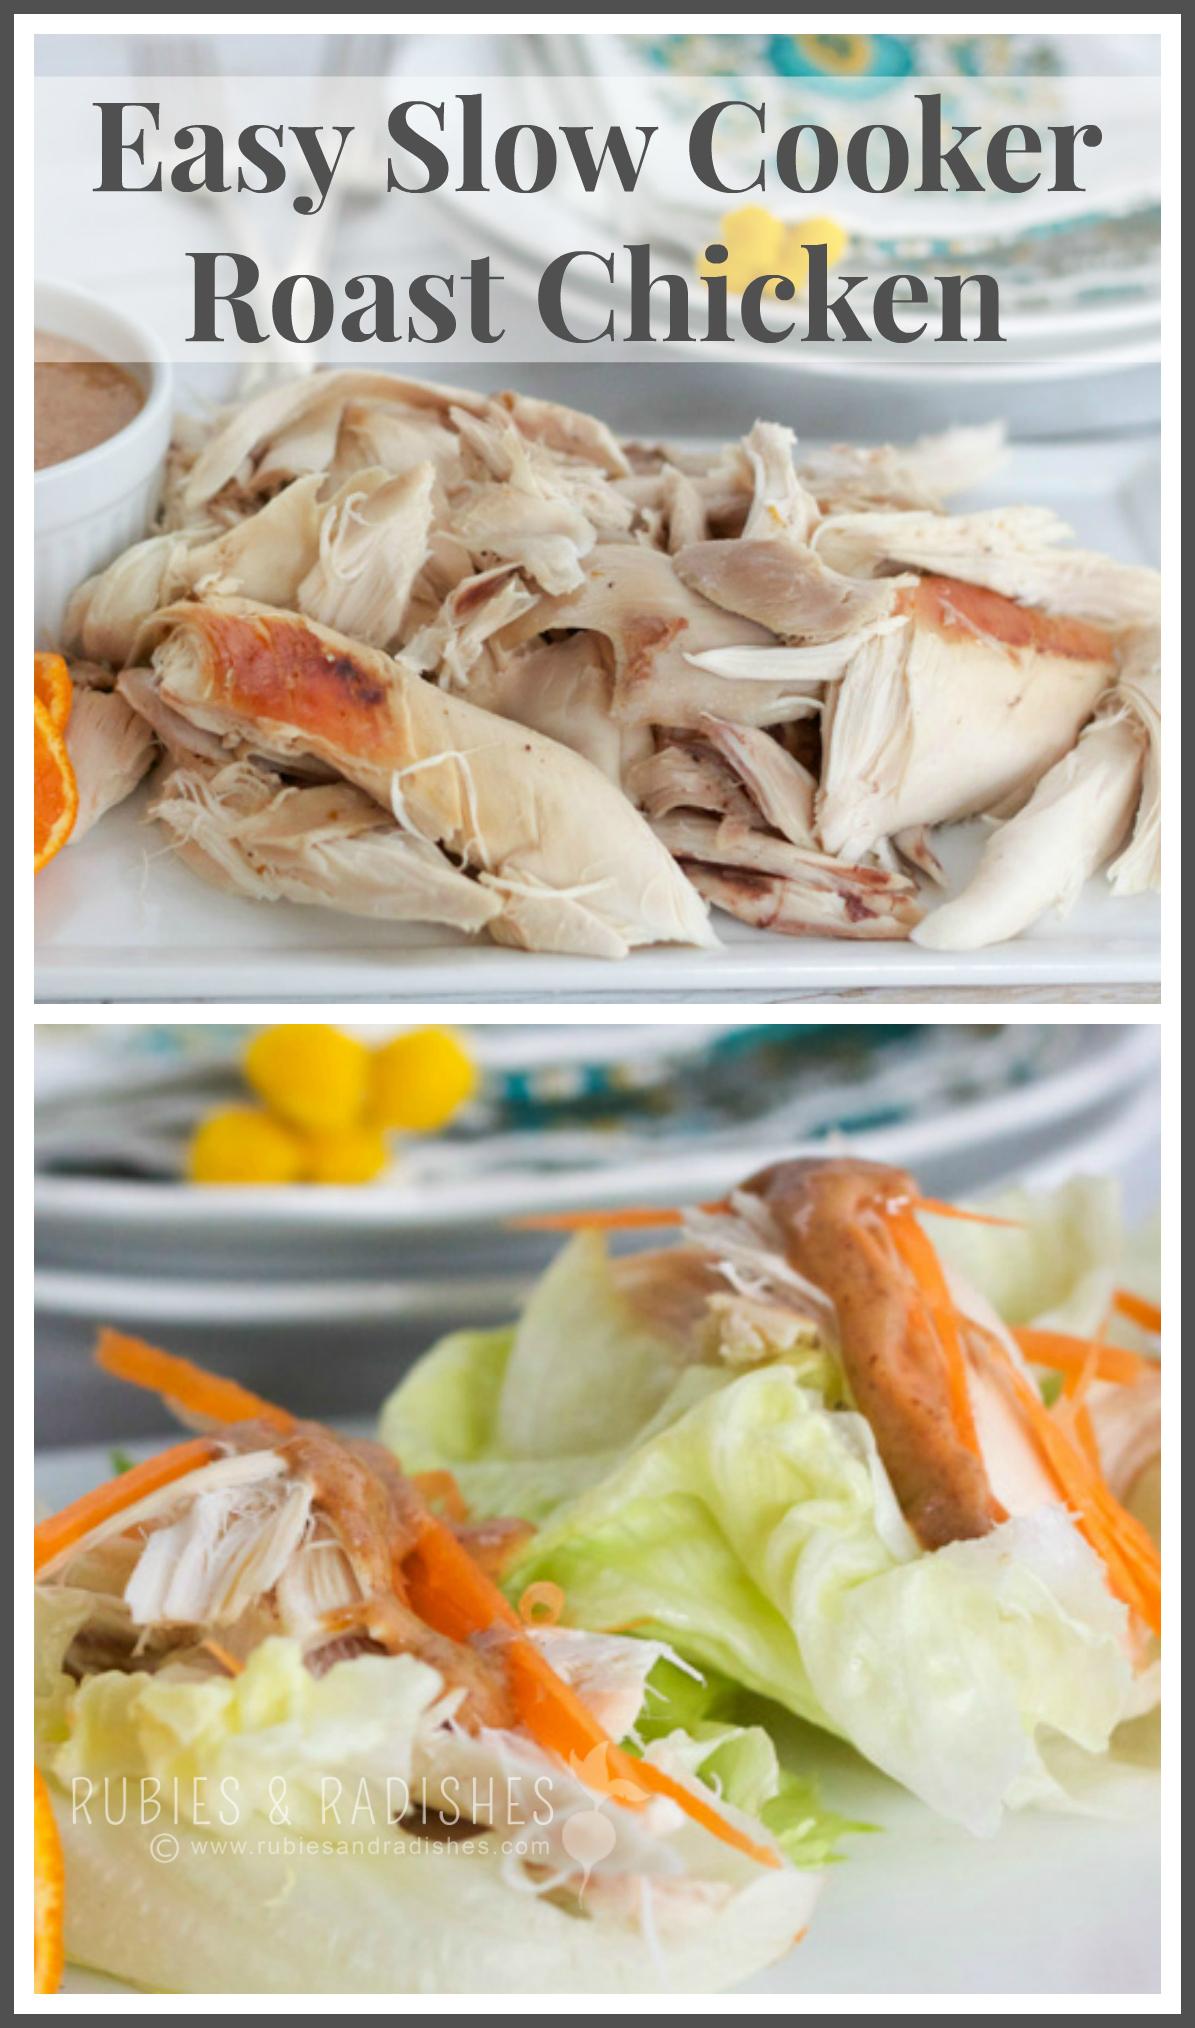 Easy Slow Cooker Roast Chicken